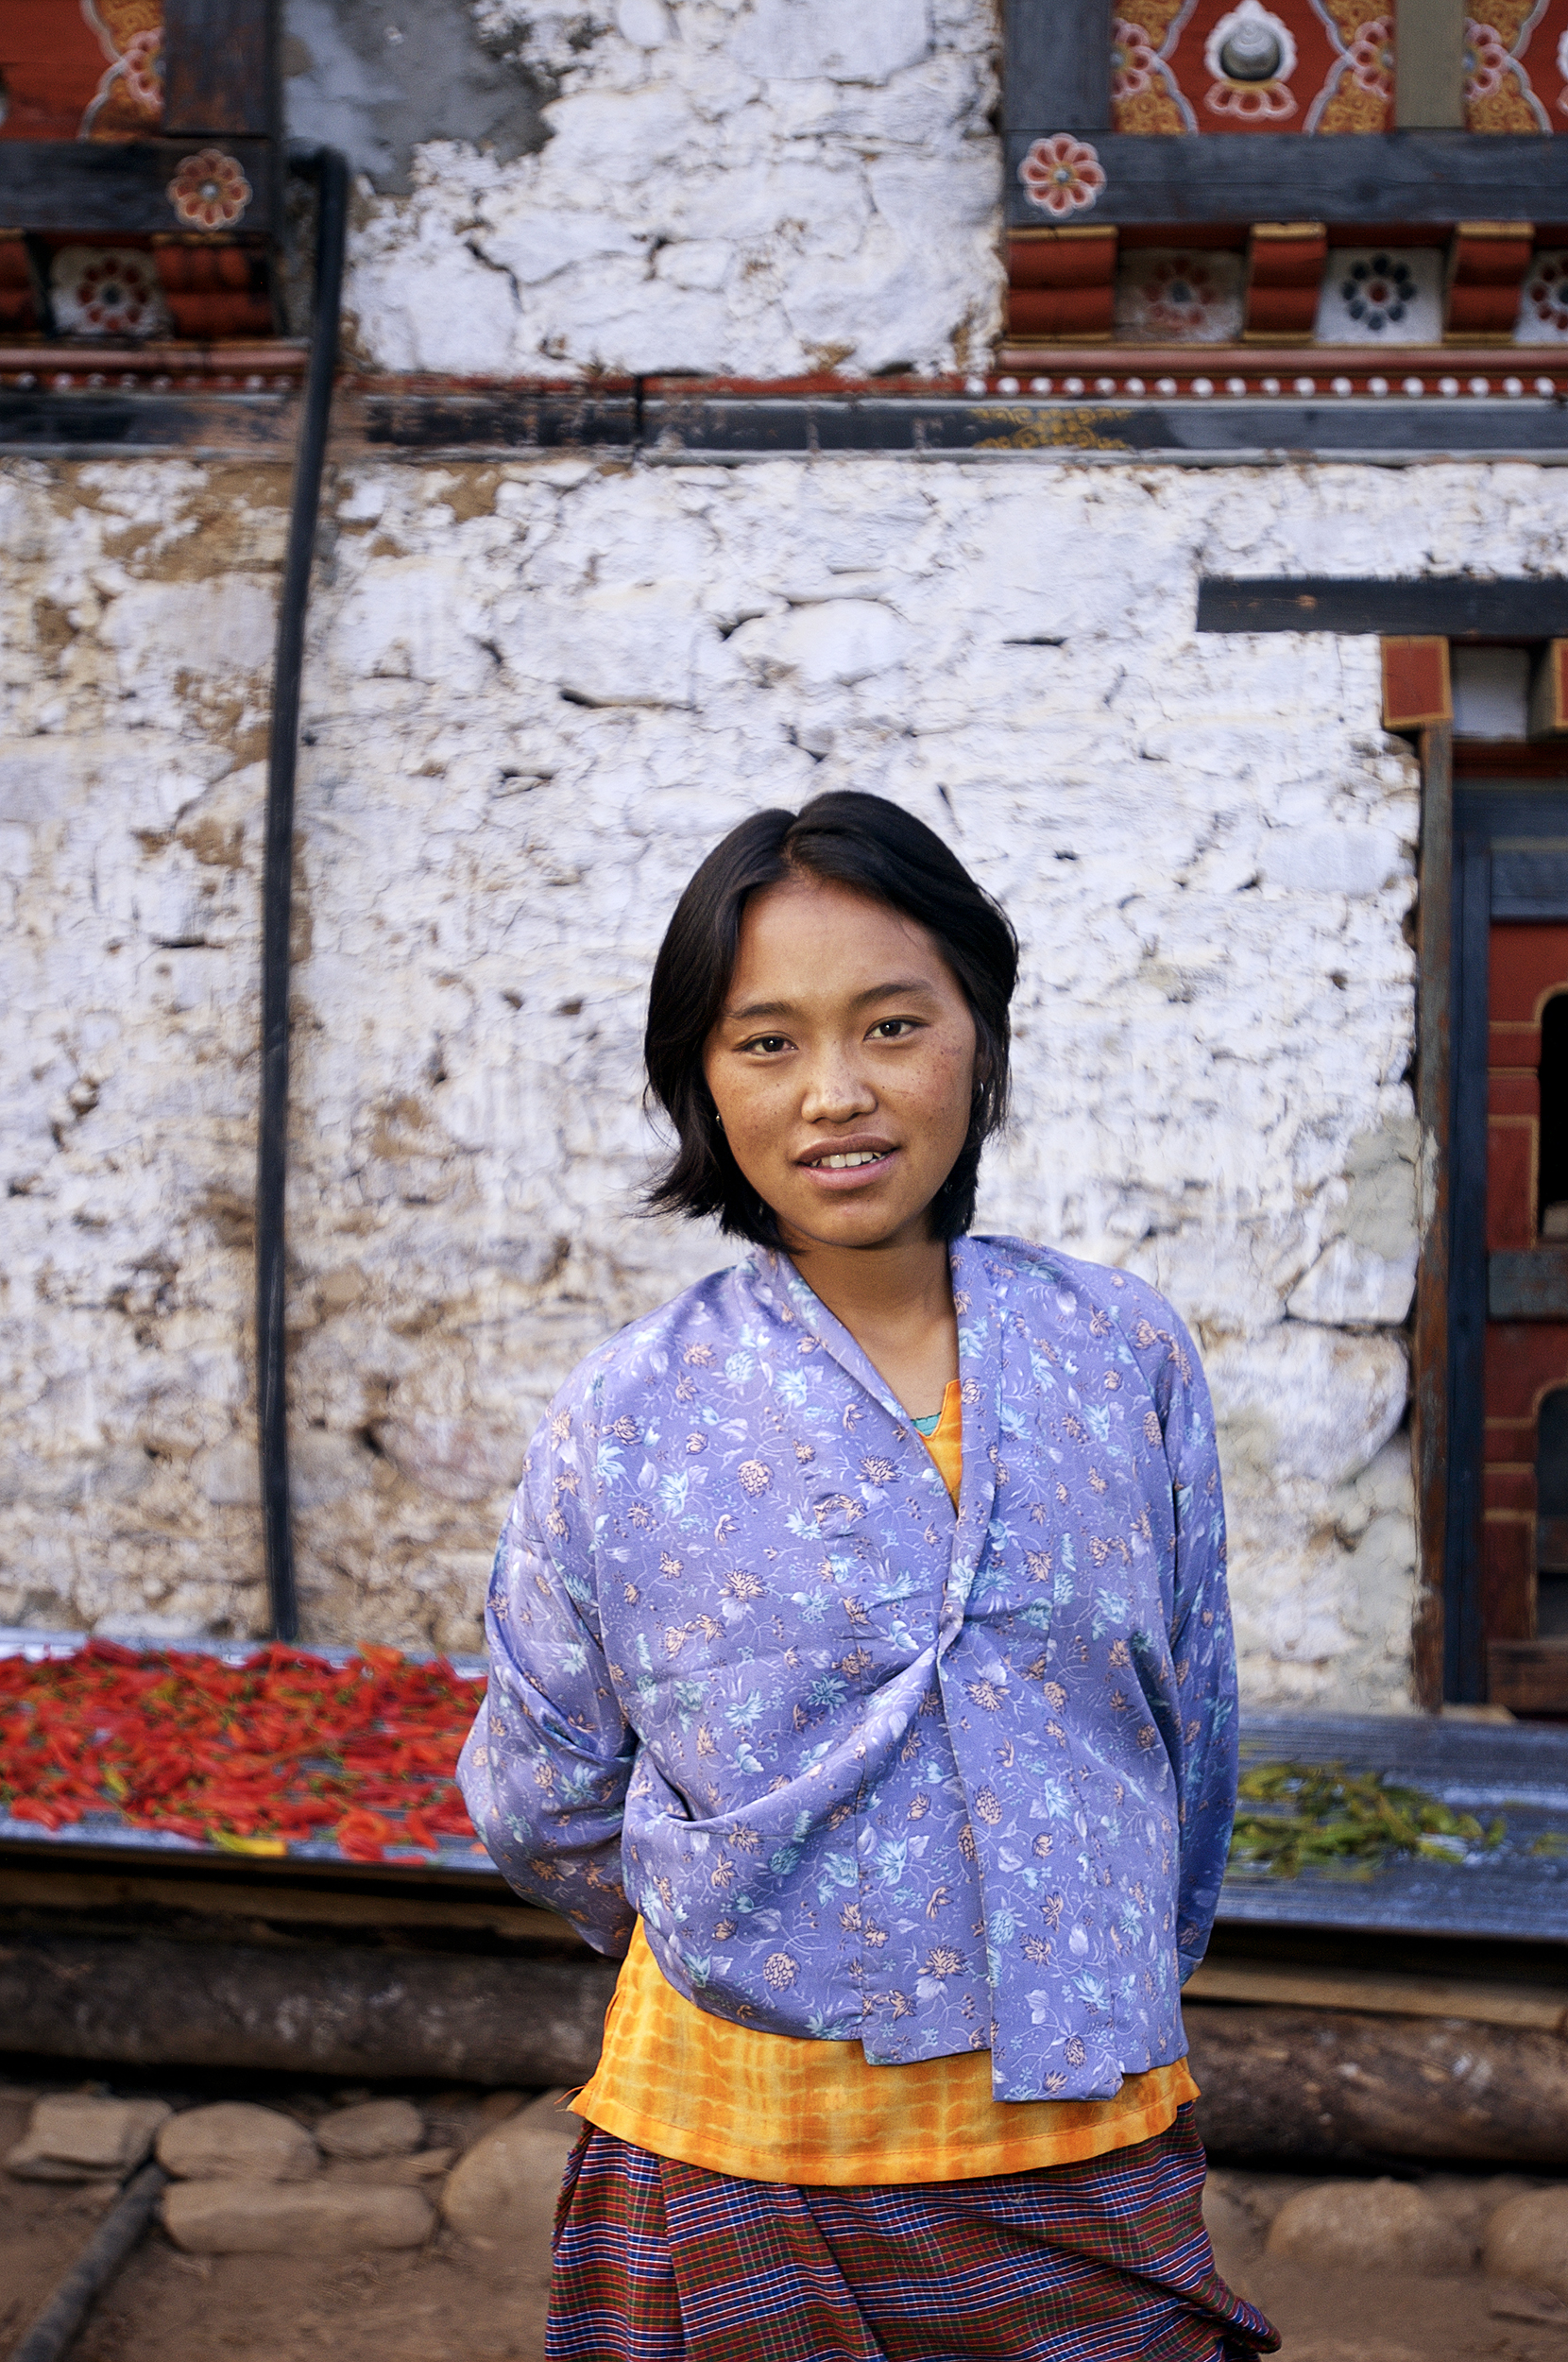 Web_Bhutan 2007_Bauerin in Bhumtang.jpg